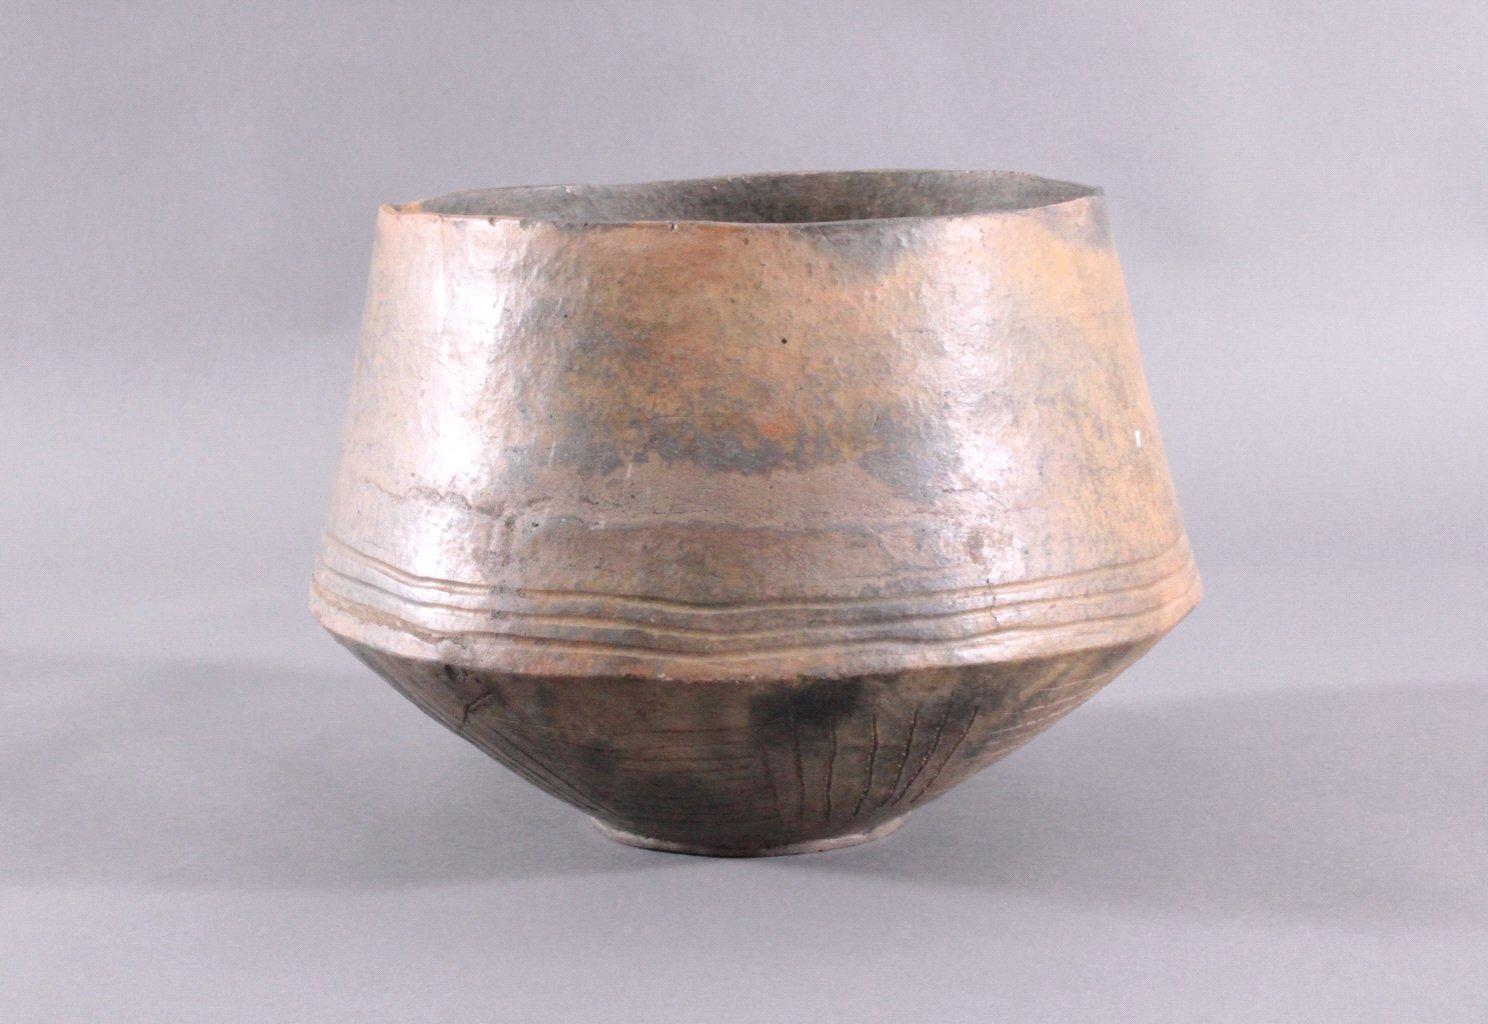 Großes Gefäß – Lausitzer Kultur 900-500 v. Chr.-1